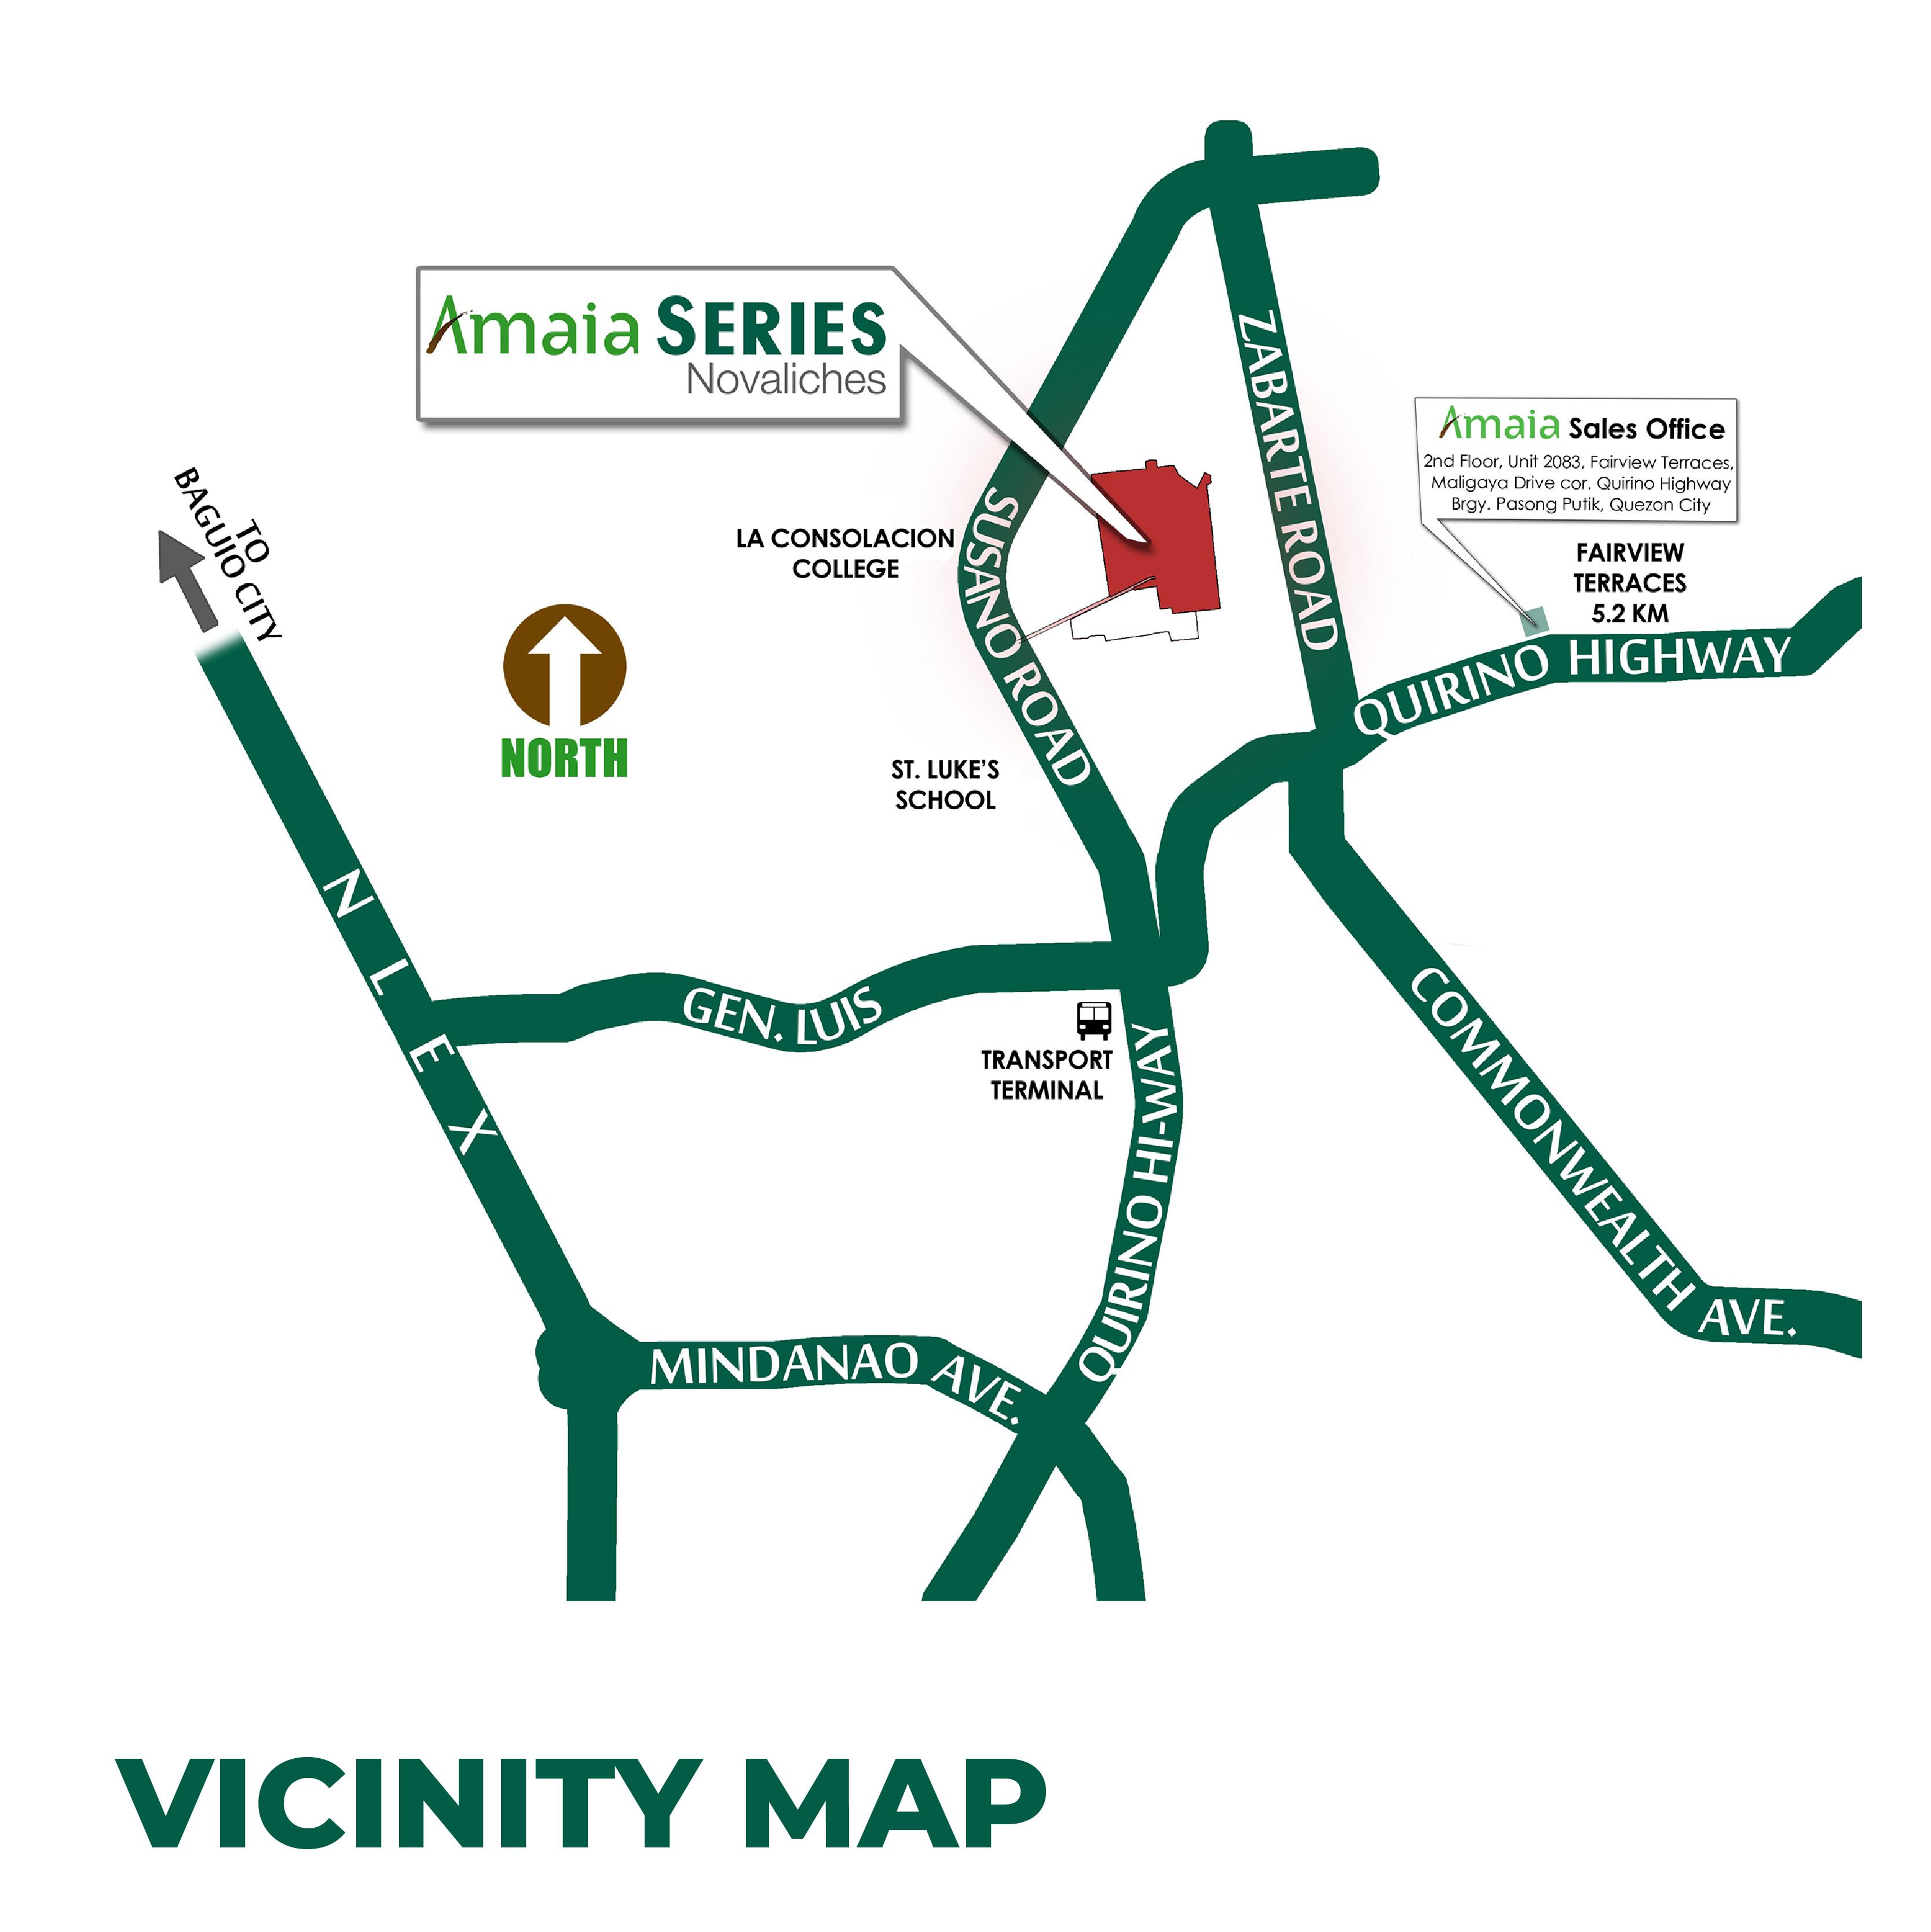 Amaia Series Novaliches Location